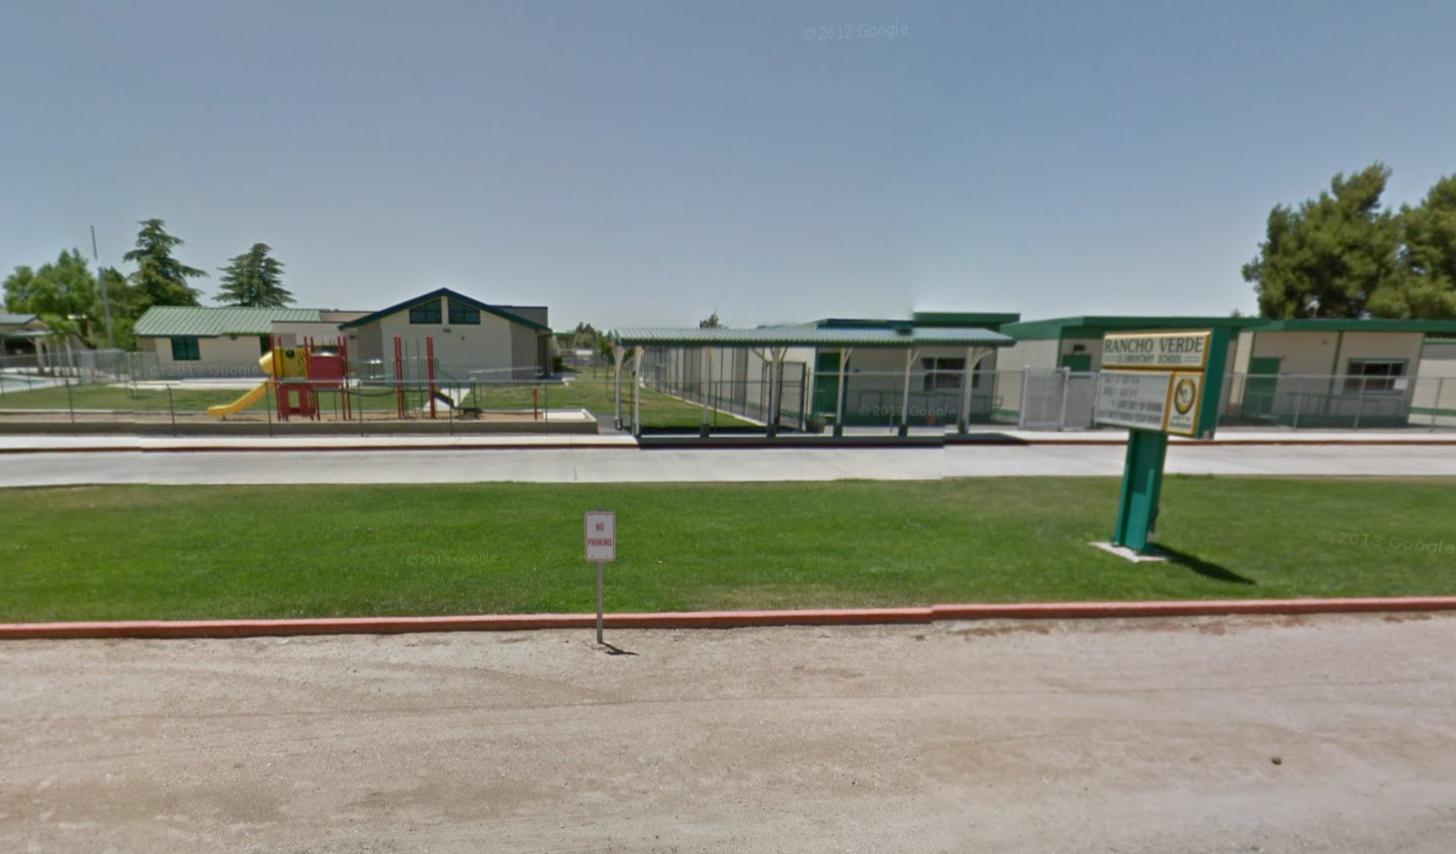 Rancho Verde Elementary